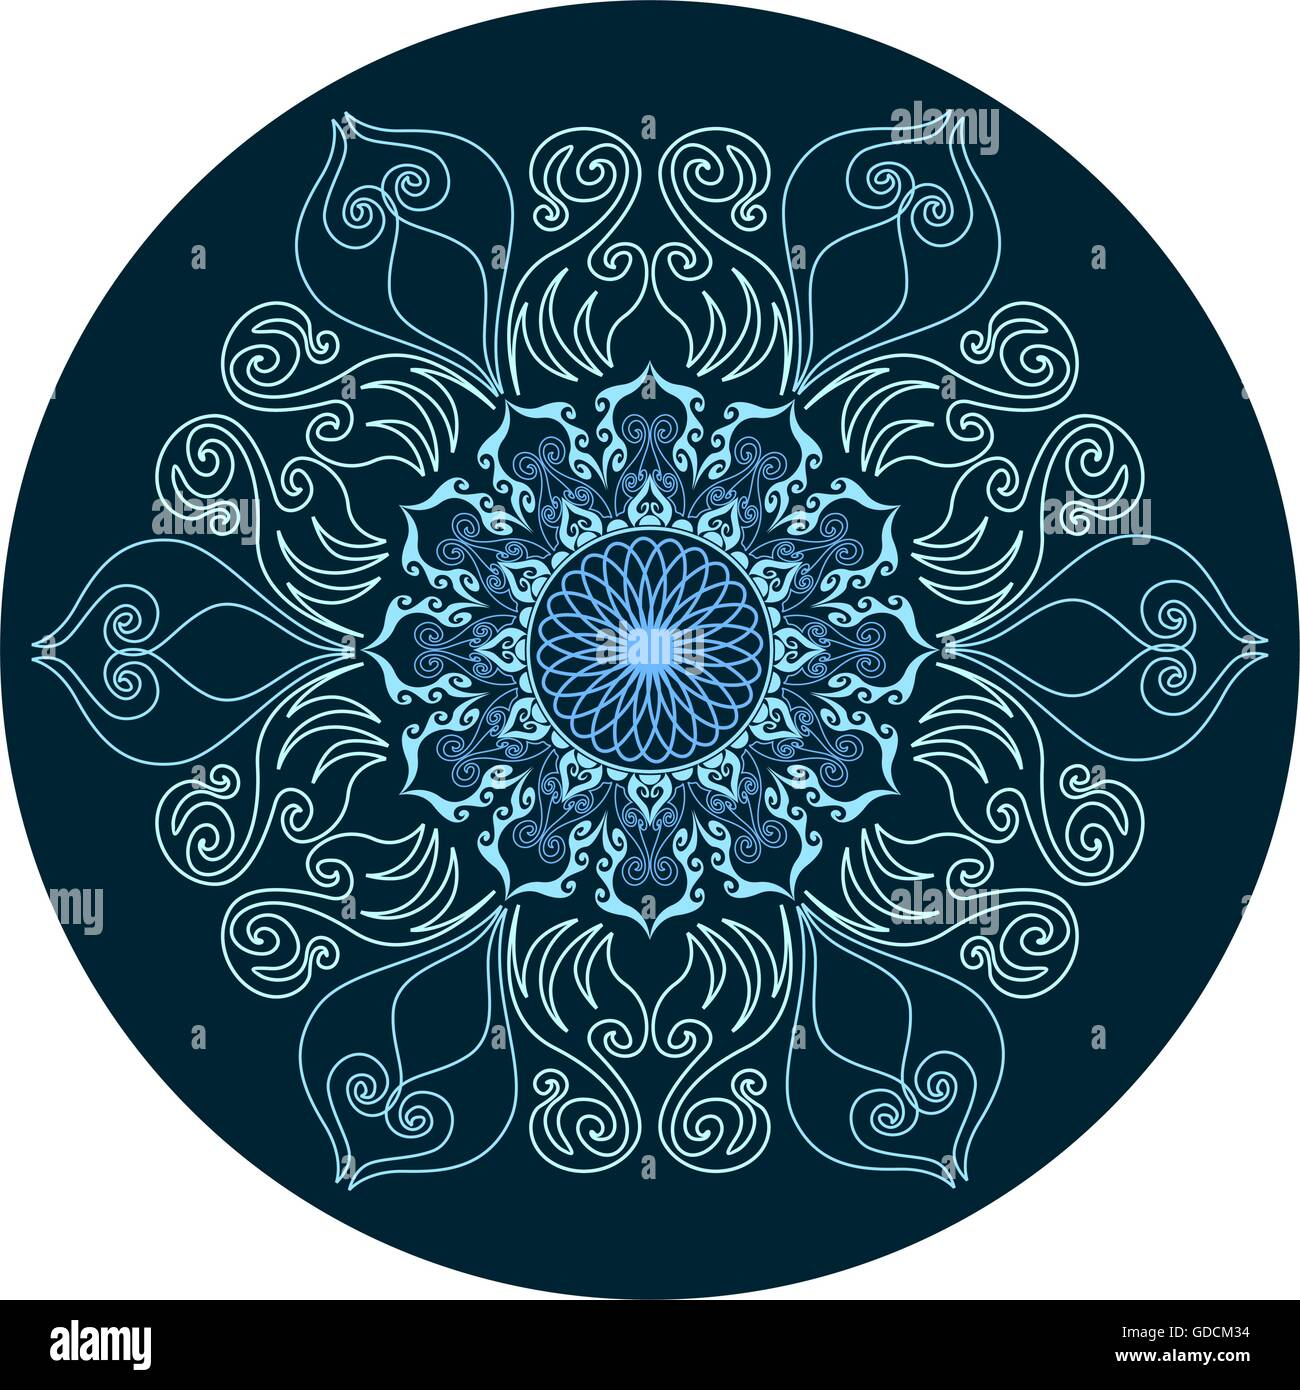 Floral design. Mandala ornament. Lace pattern. - Stock Image